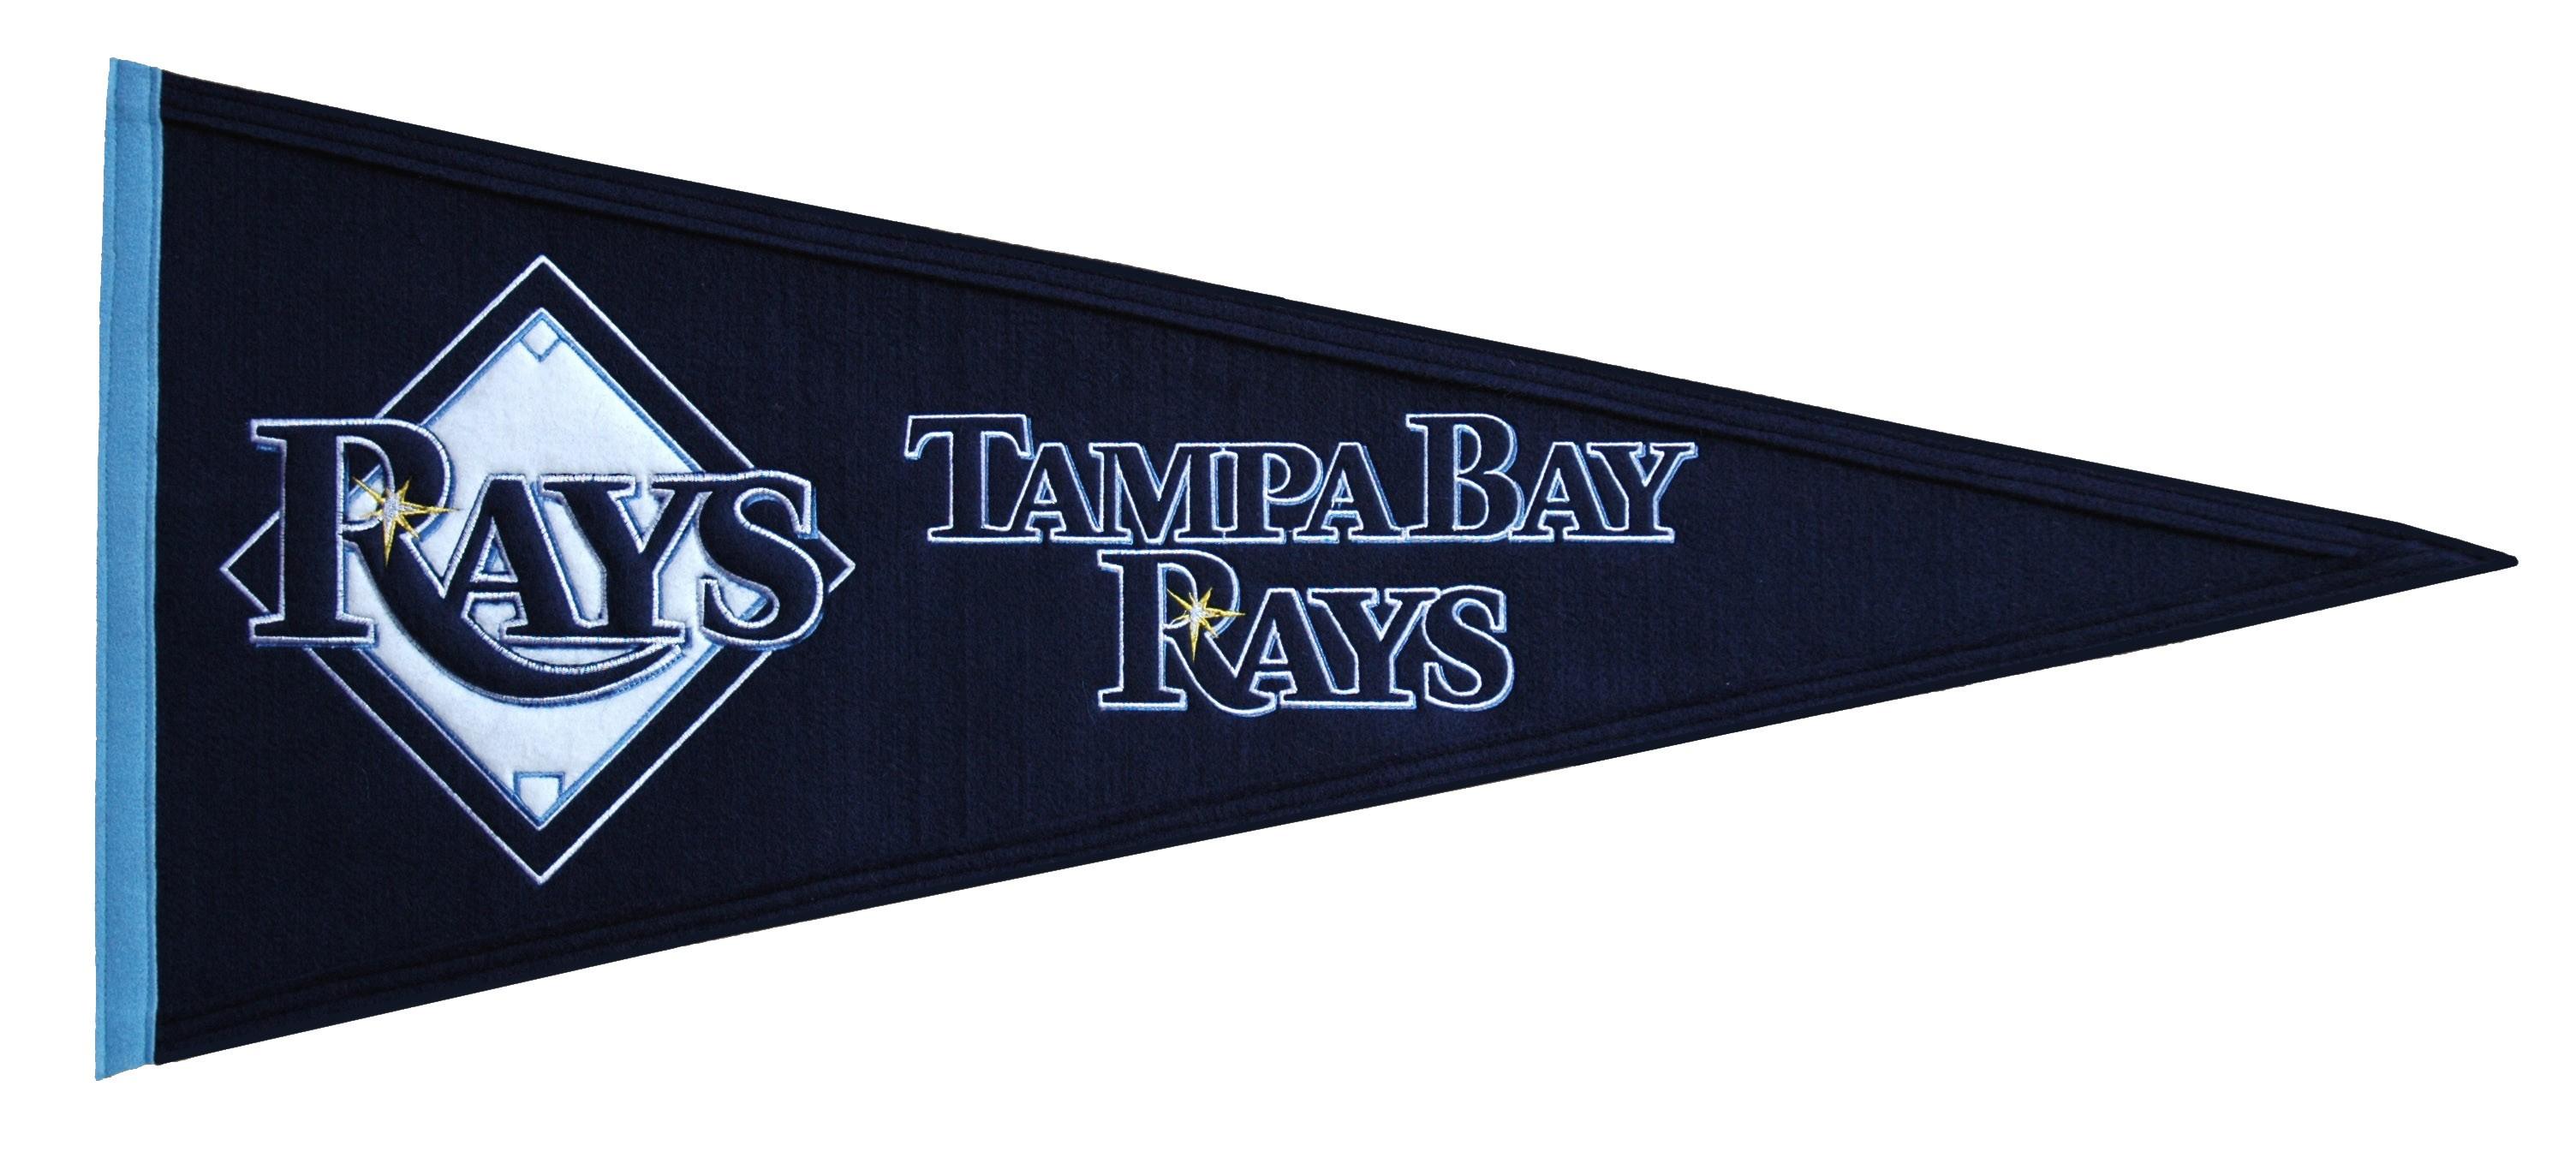 TAMPA BAY RAYS baseball mlb g wallpaper background 3008x1352